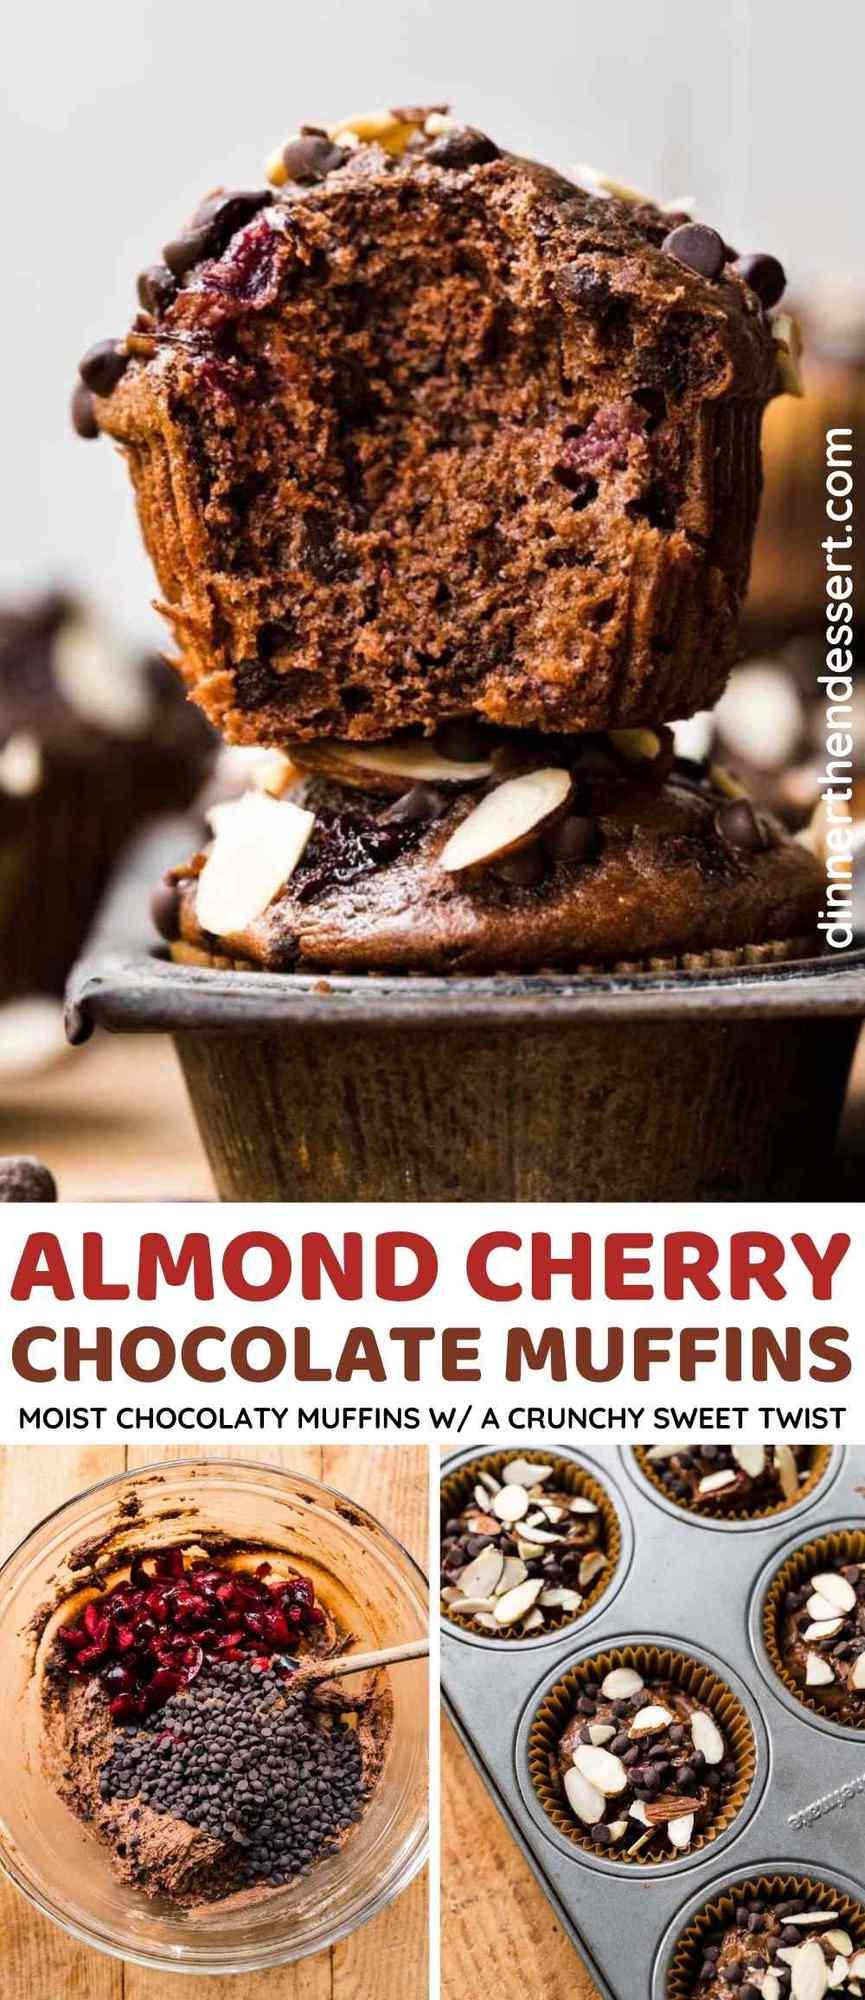 Almond Cherry Chocolate Muffins Collage